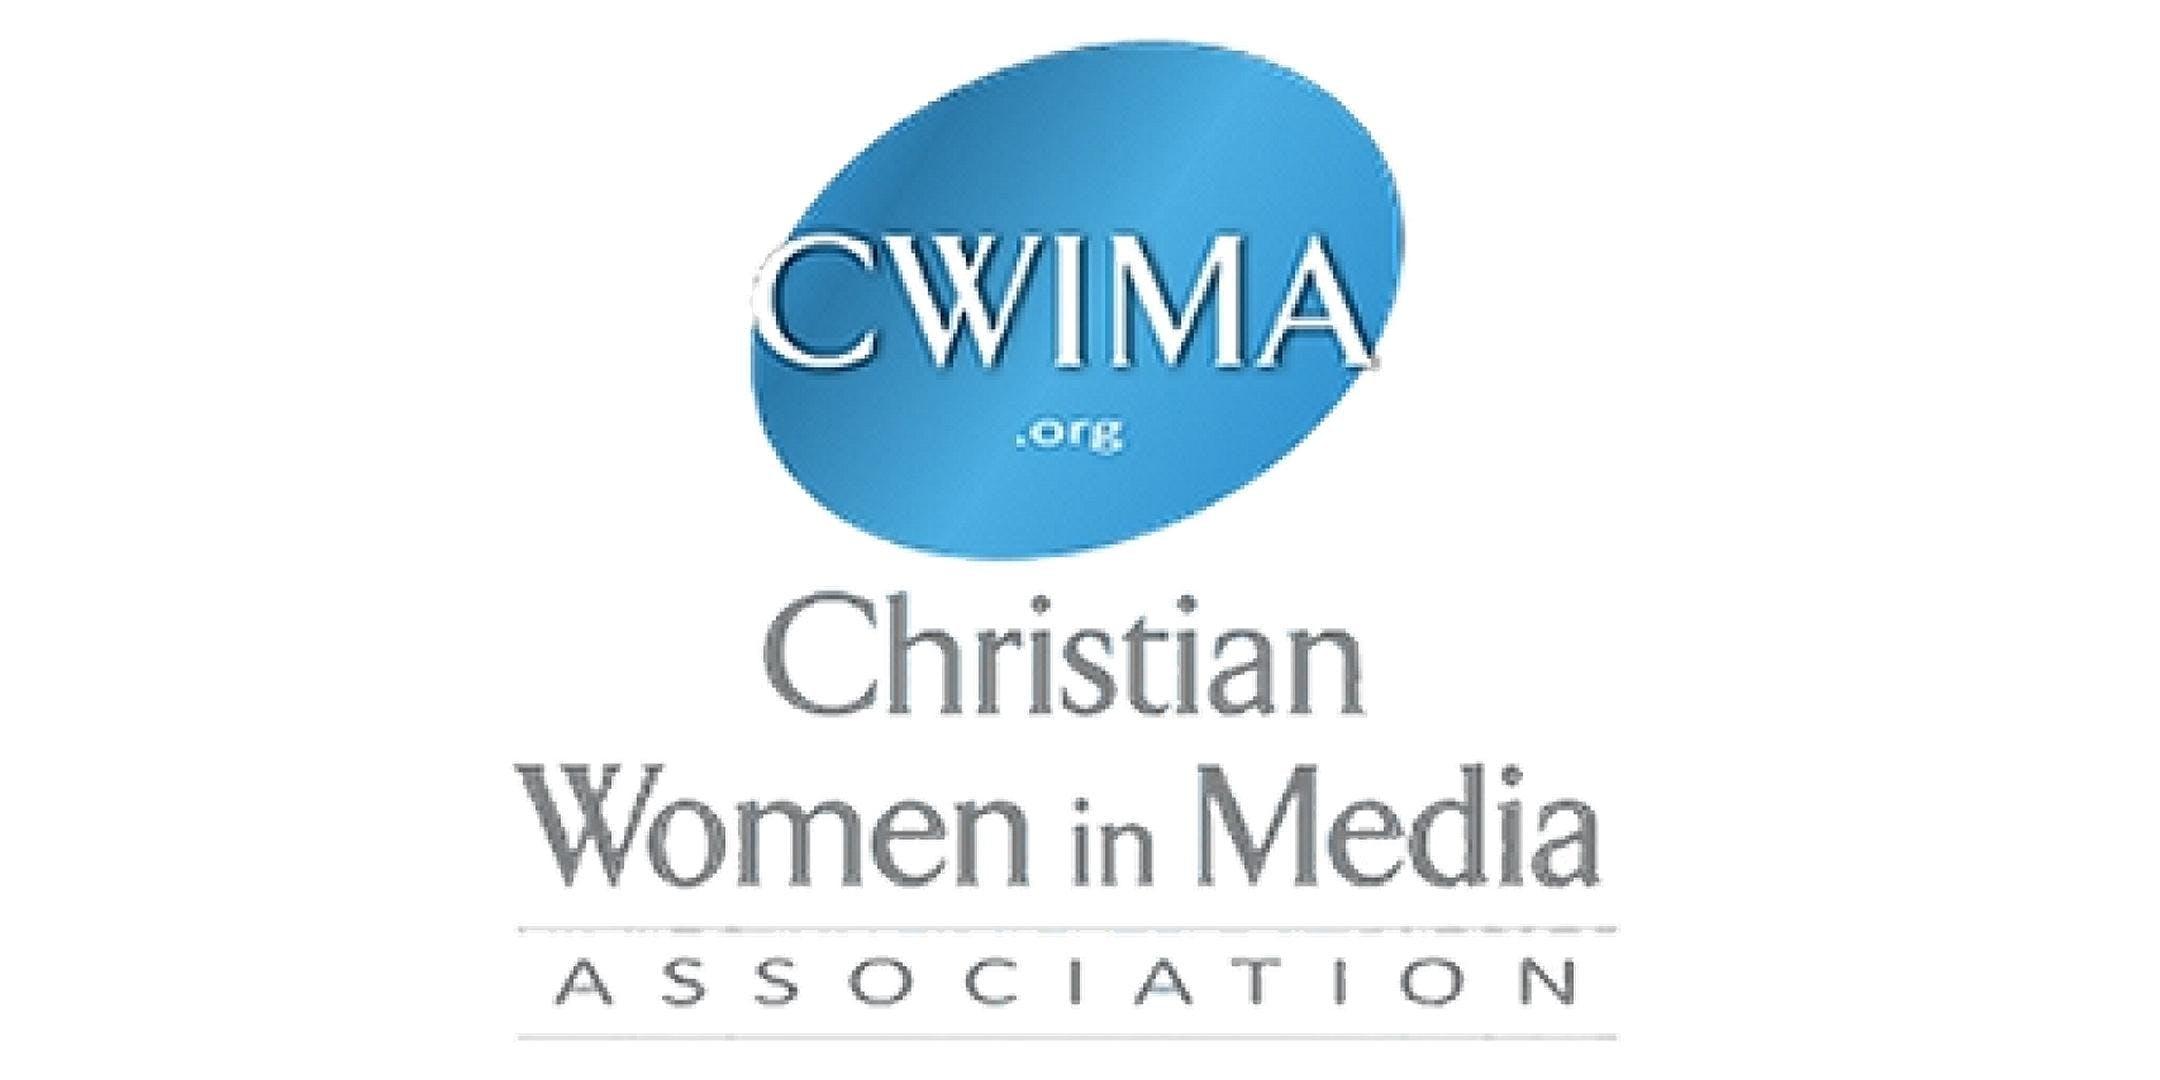 CWIMA Connect Event - New York, NY - November 21, 2019